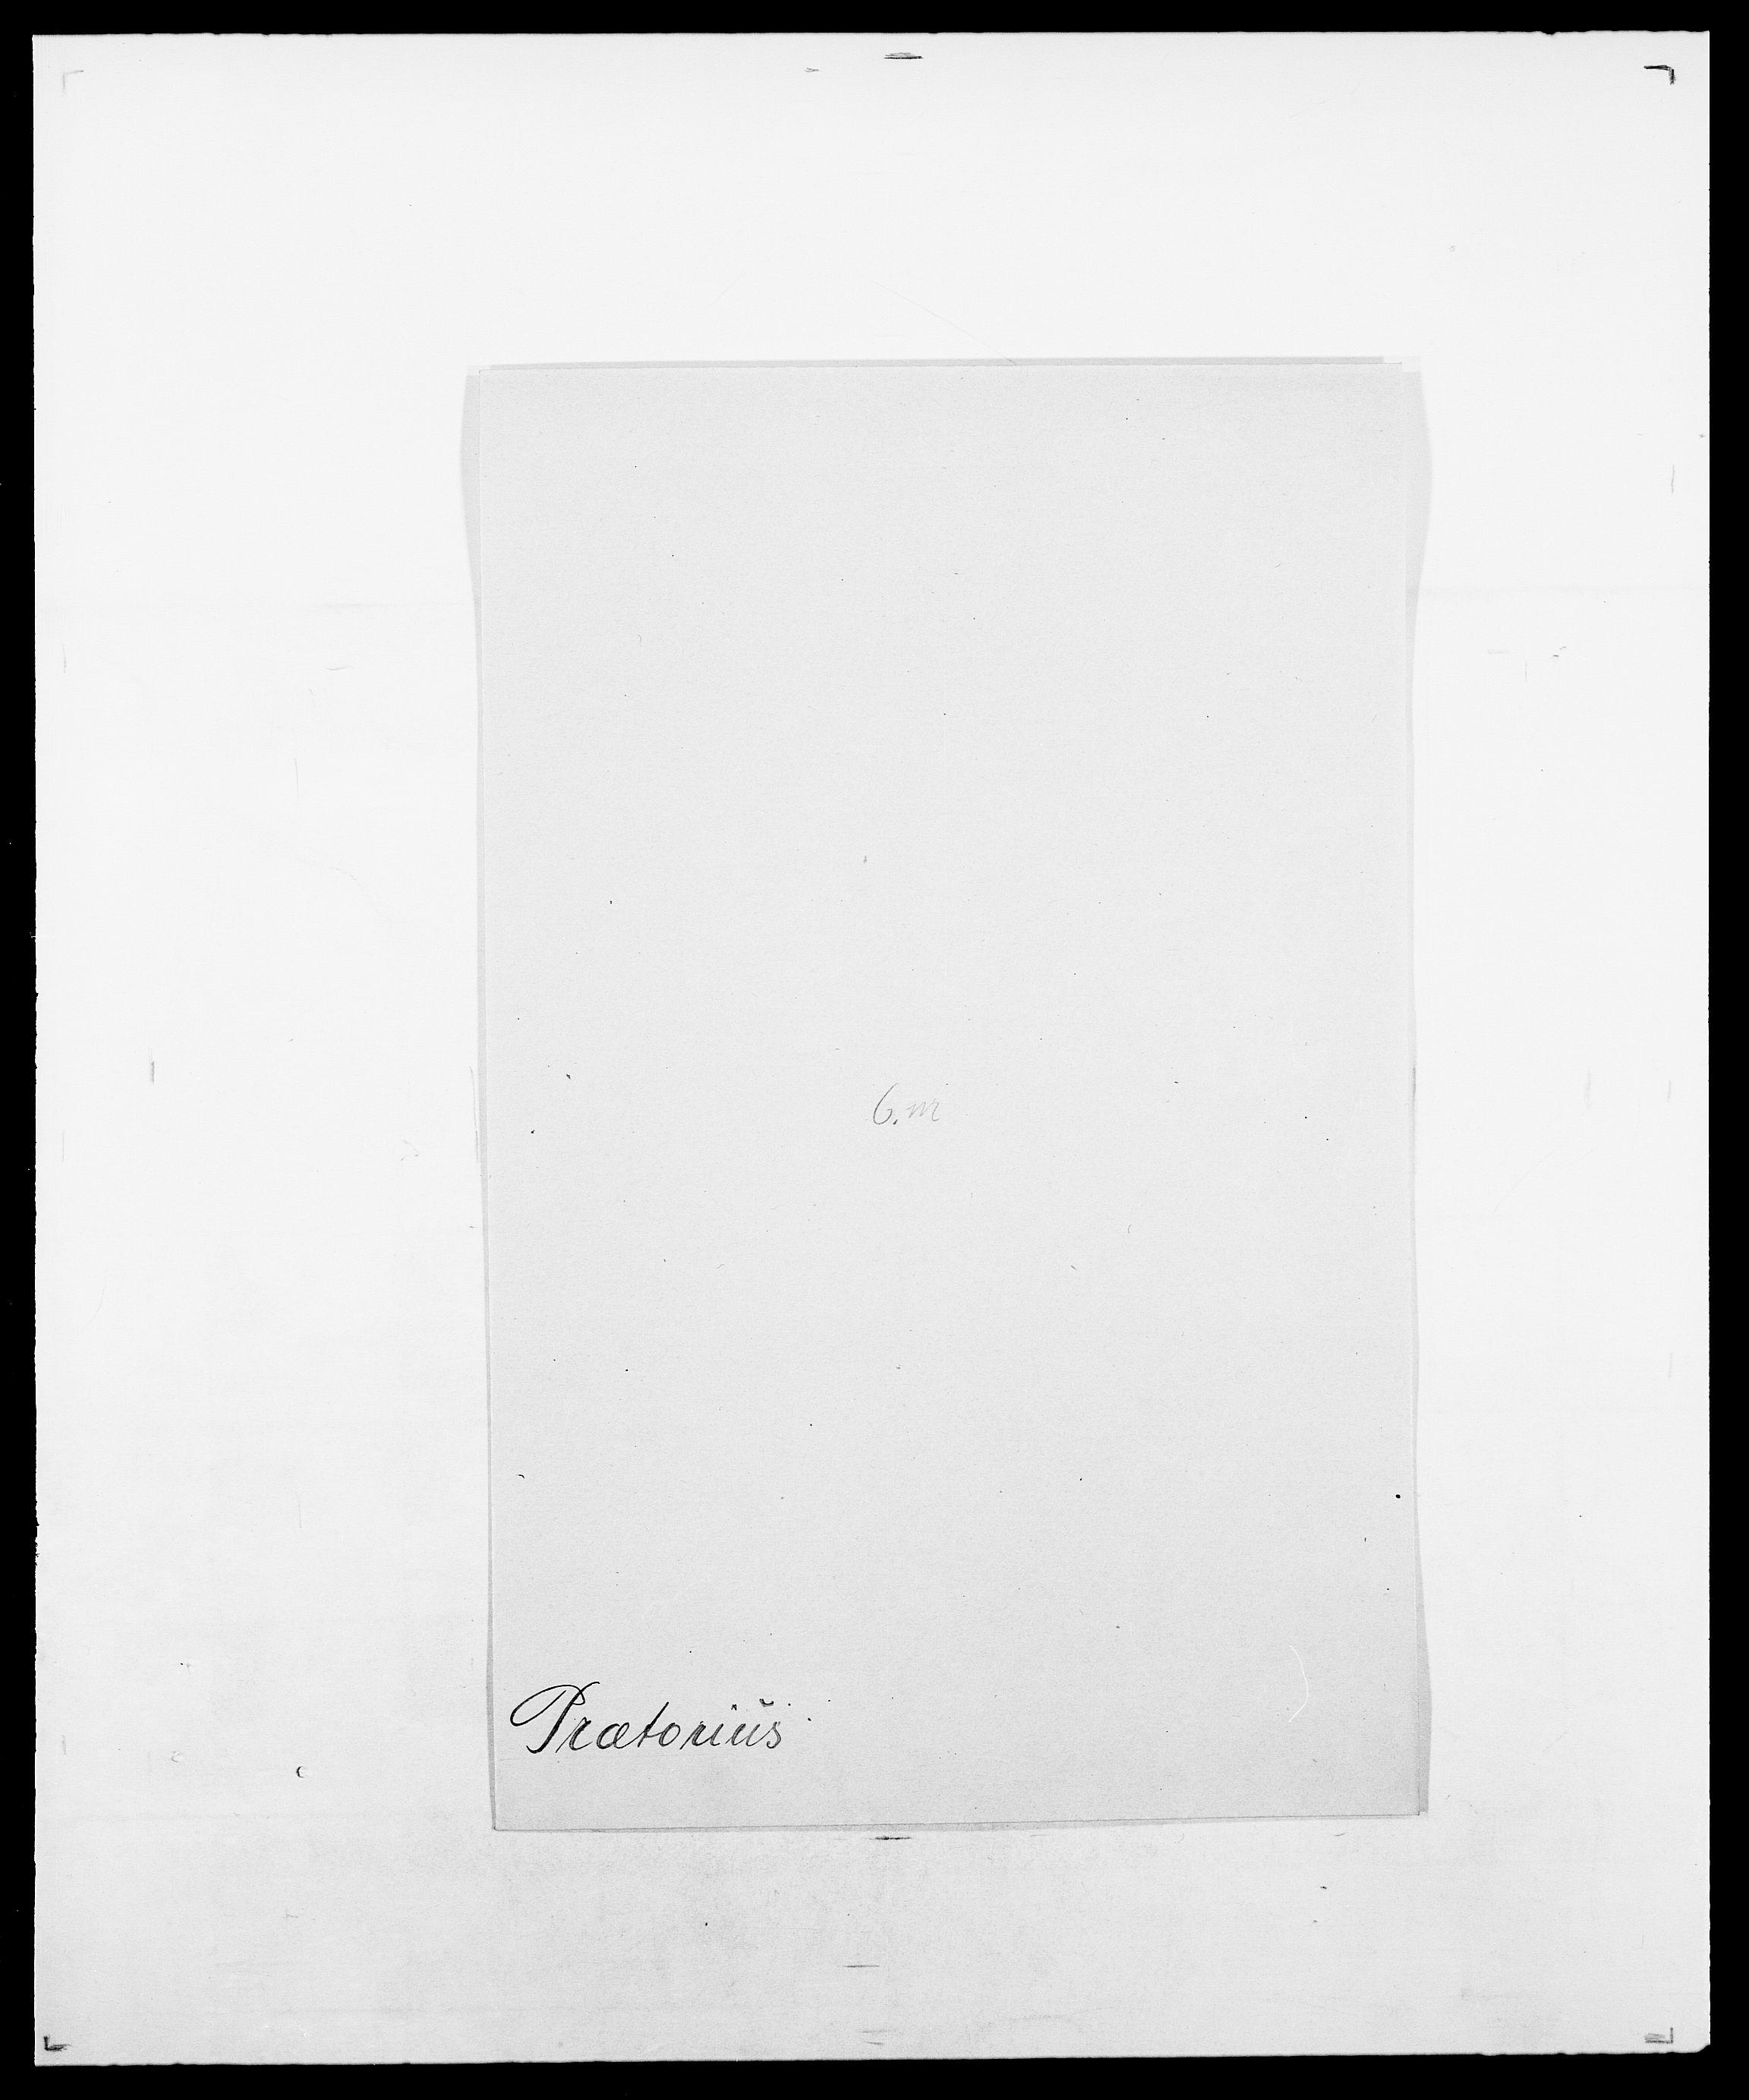 SAO, Delgobe, Charles Antoine - samling, D/Da/L0031: de Place - Raaum, s. 407